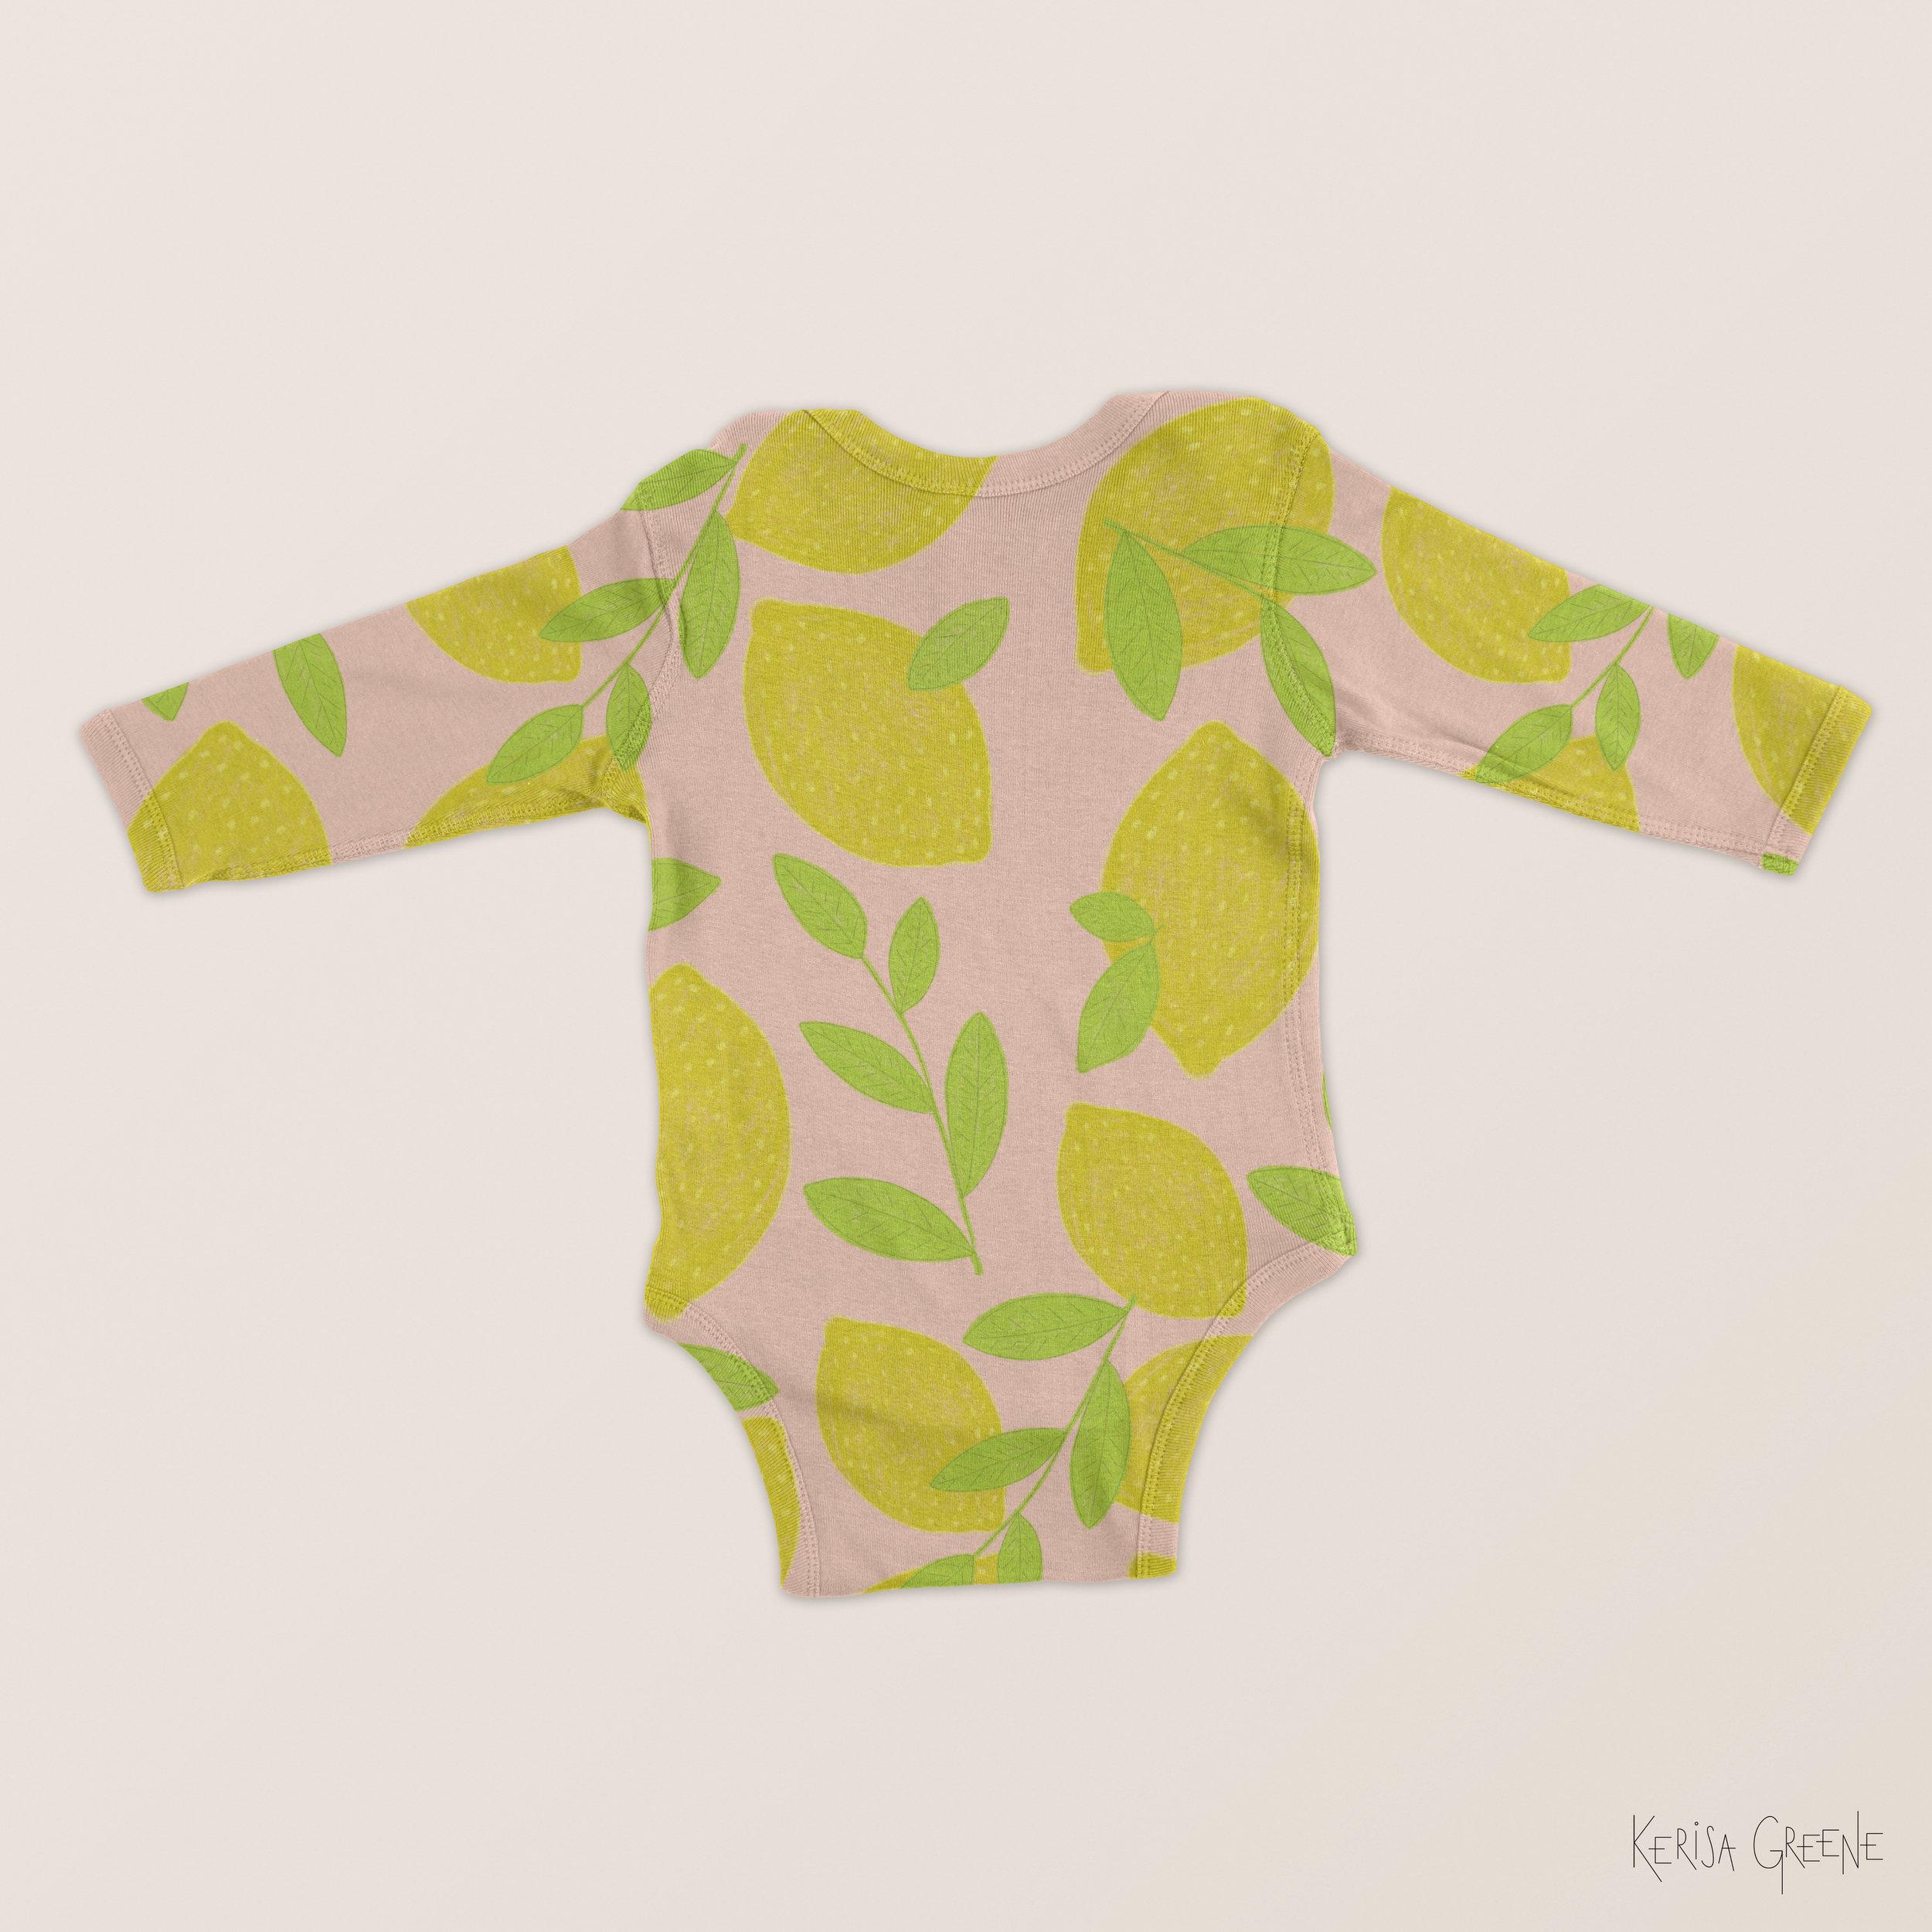 Cute Kids Baby Surface Pattern Design Lemon Print Illustration By Kerisa Greene